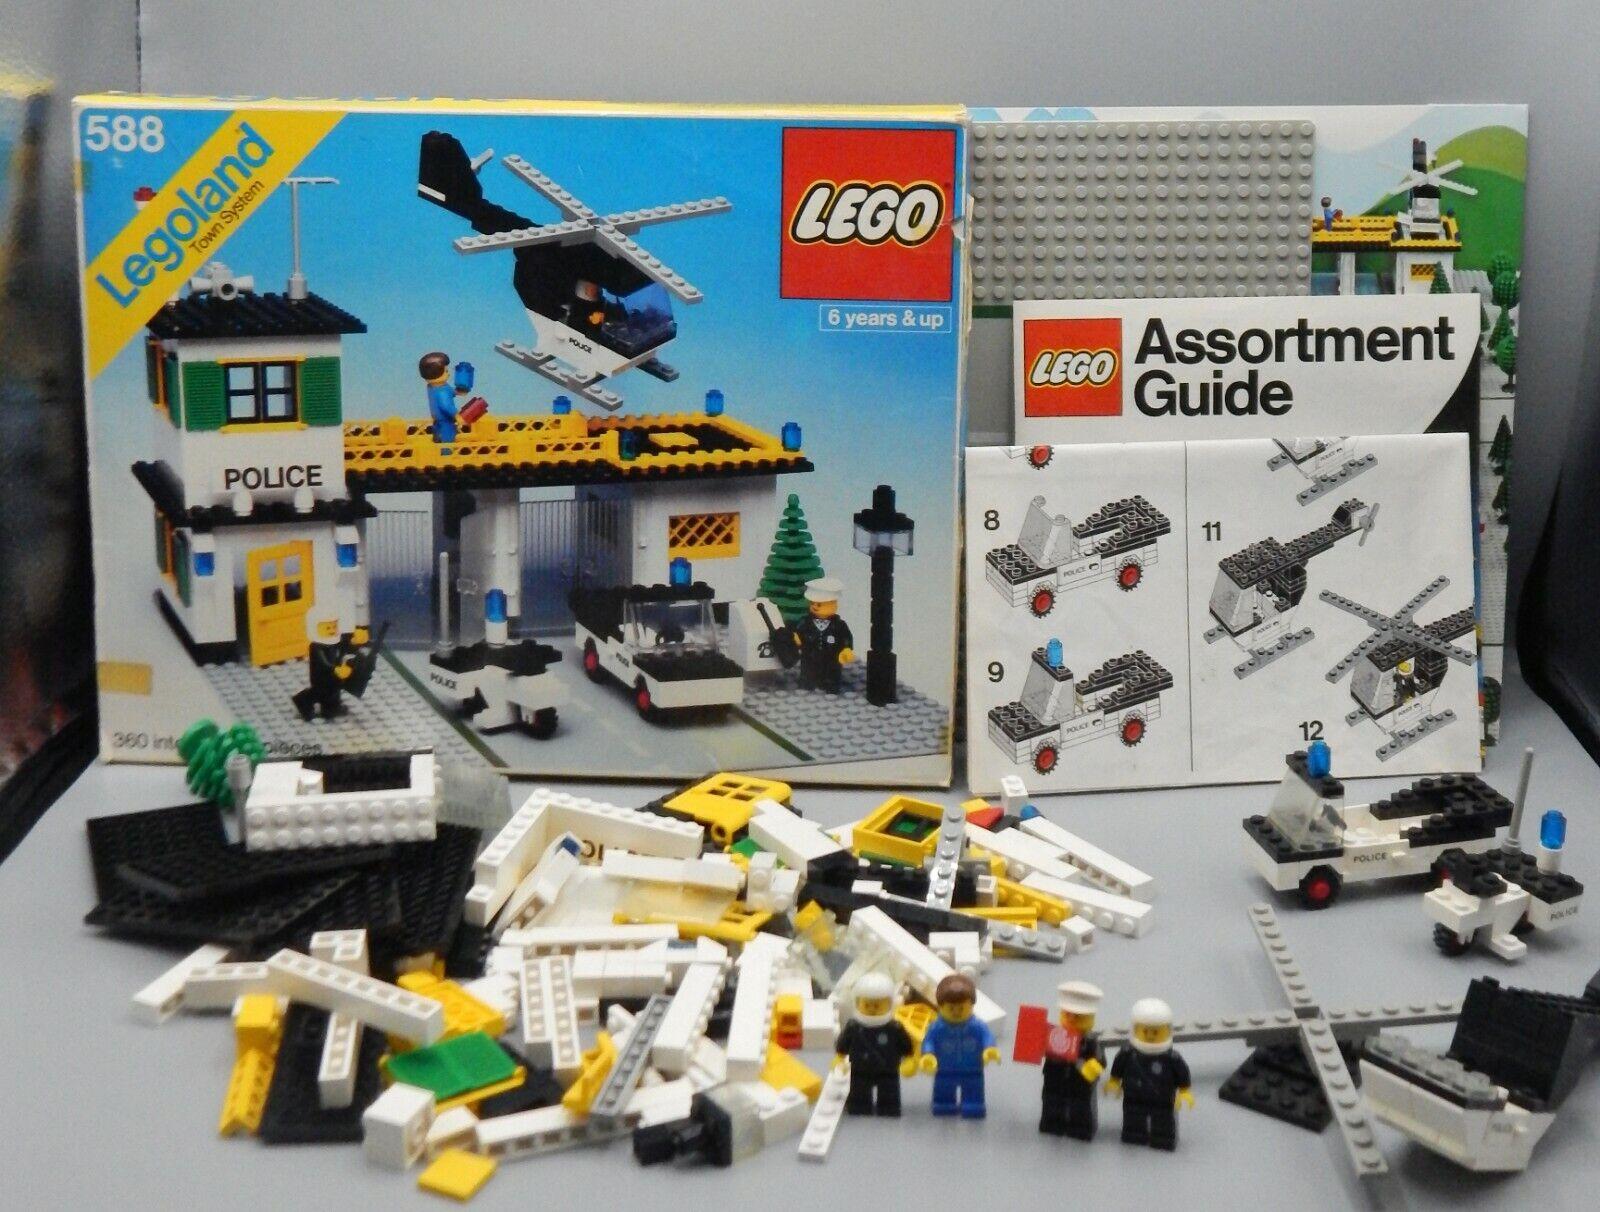 Vintage 1979 LEGO Town Police Headquarters 588 COMPLETE w  Box LEGOLAND City